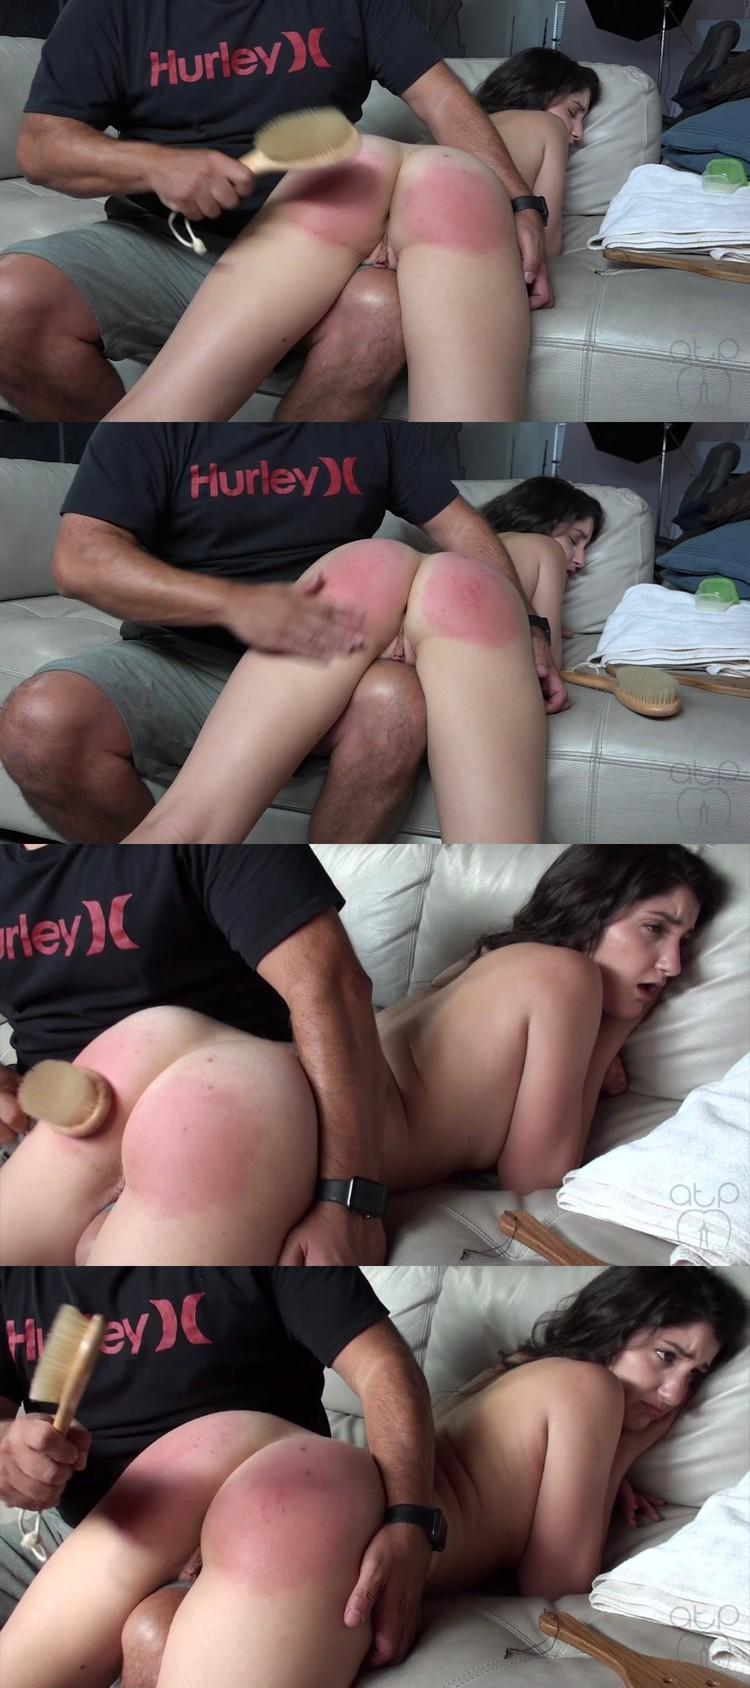 Arielle lane spanked like a bad girl